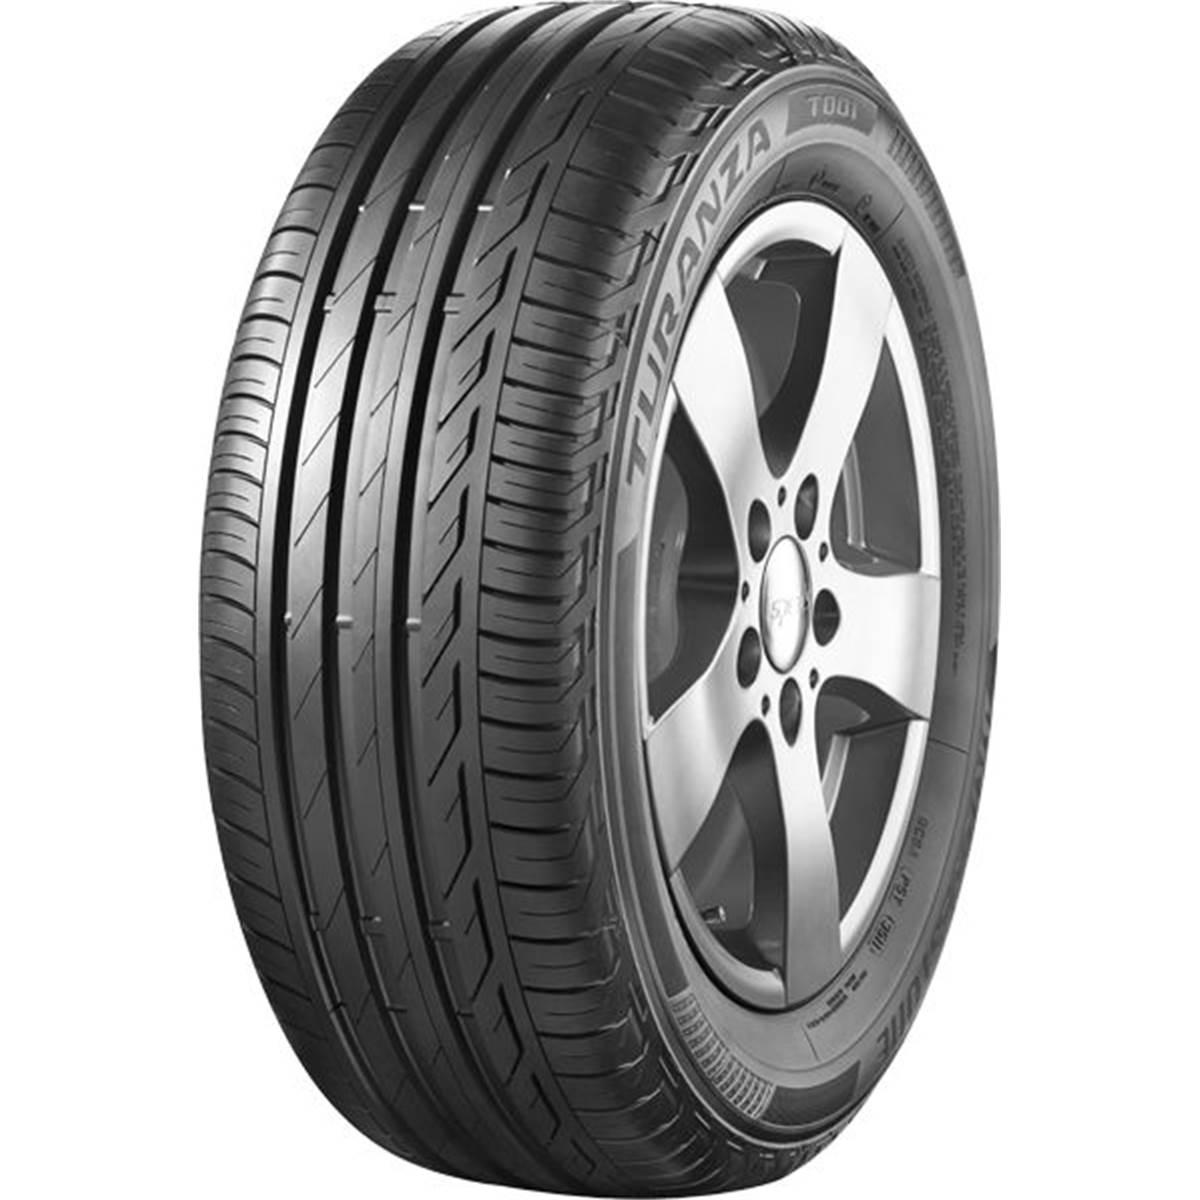 Pneu Bridgestone 195/65R15 91H Turanza T001